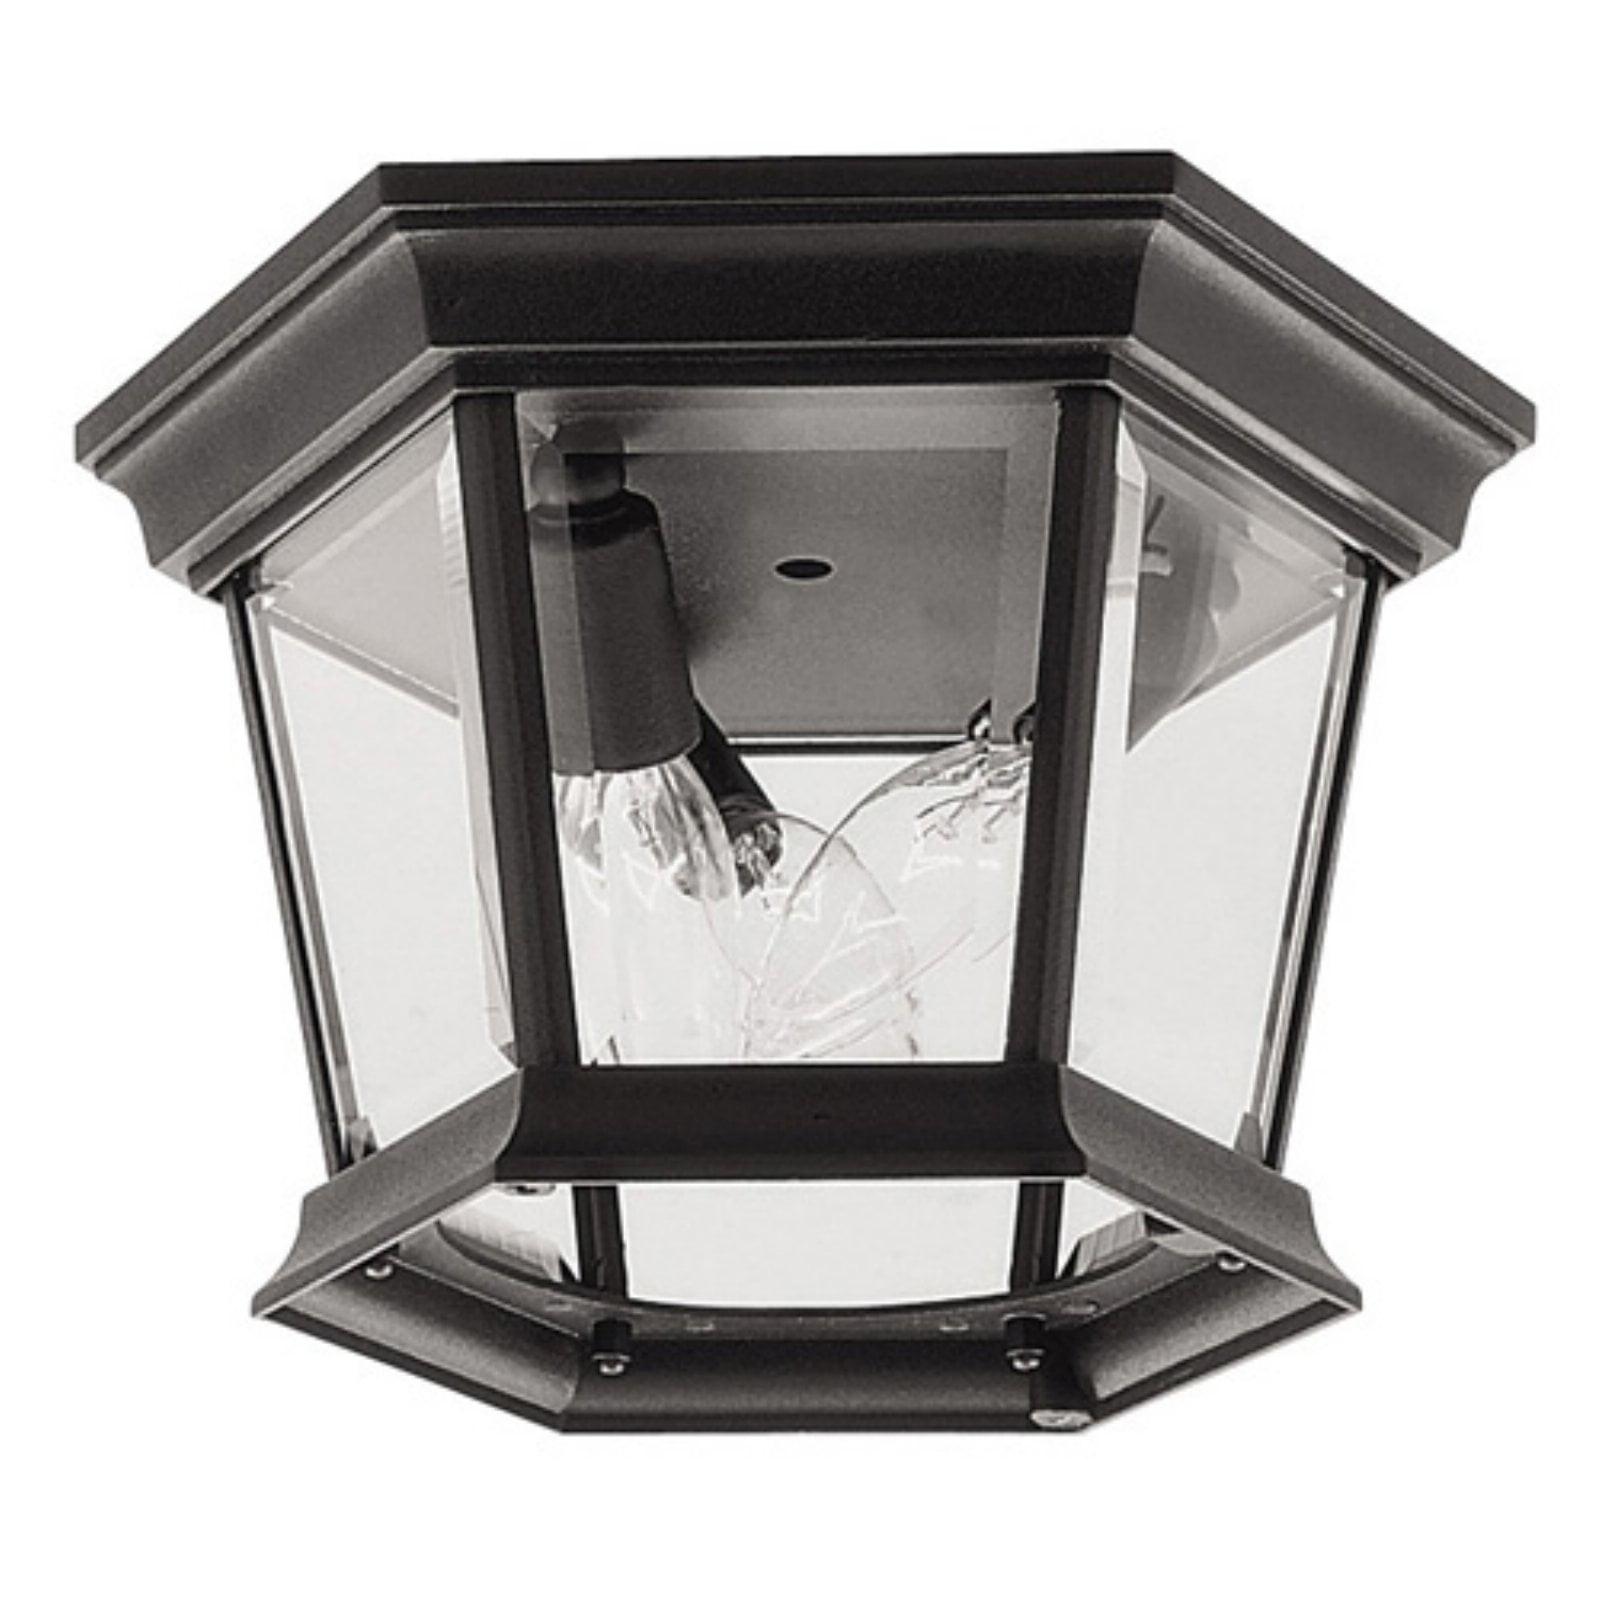 Livex Lighting Hamilton 3 Light Outdoor Ceiling Mount